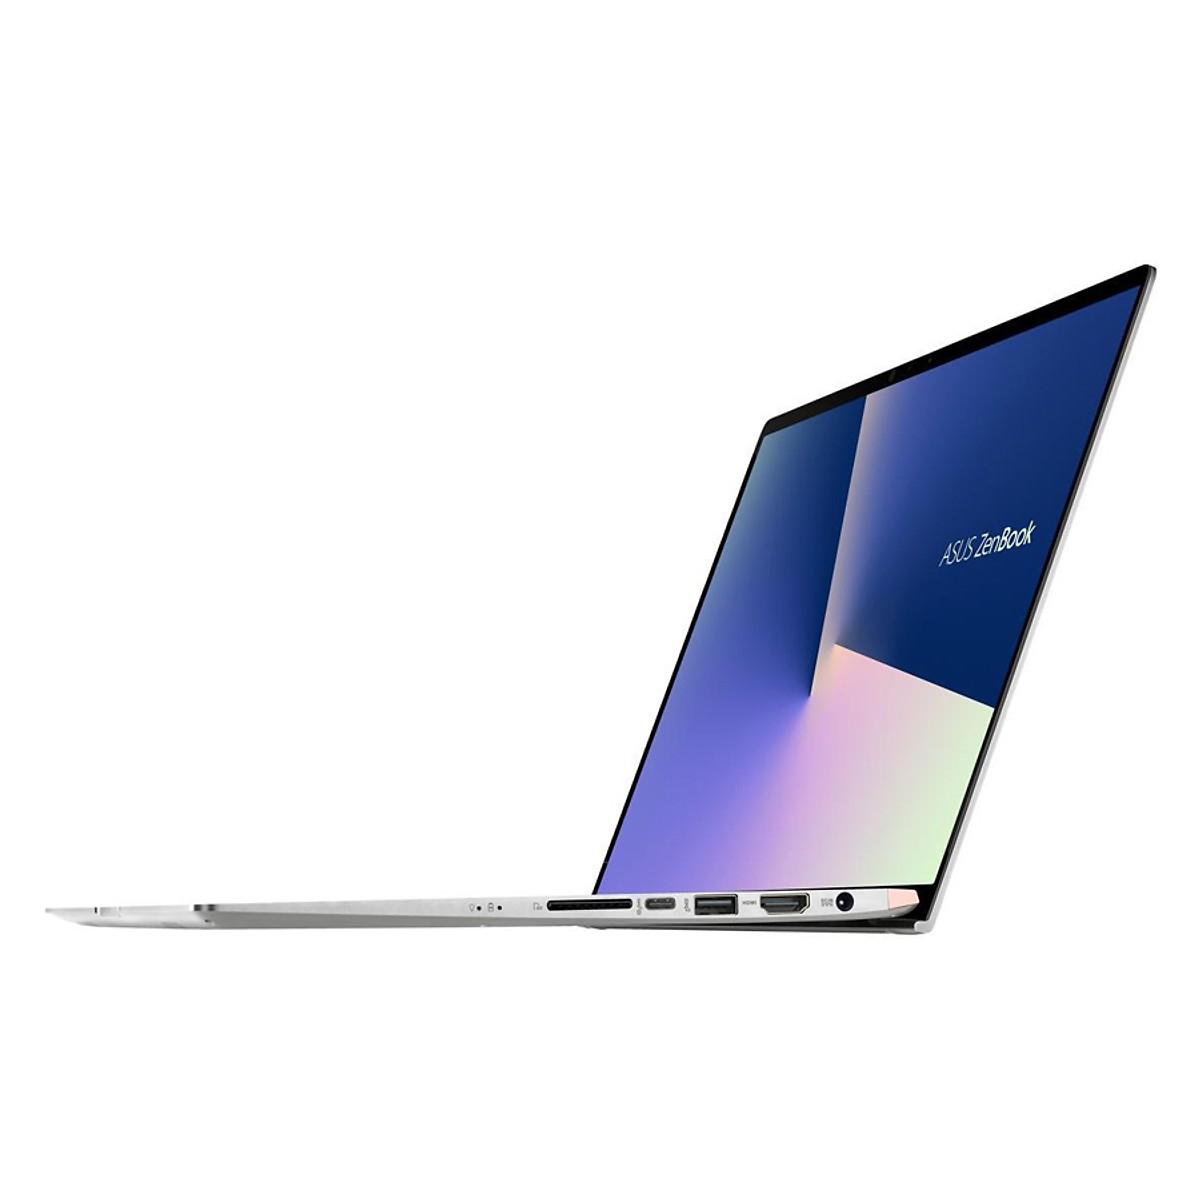 Asus   Máy tính xách tay - Laptop  Laptop Asus Zenbook 15 UX533FD-A9091T Core i5-8265U/ Win10 (15.6